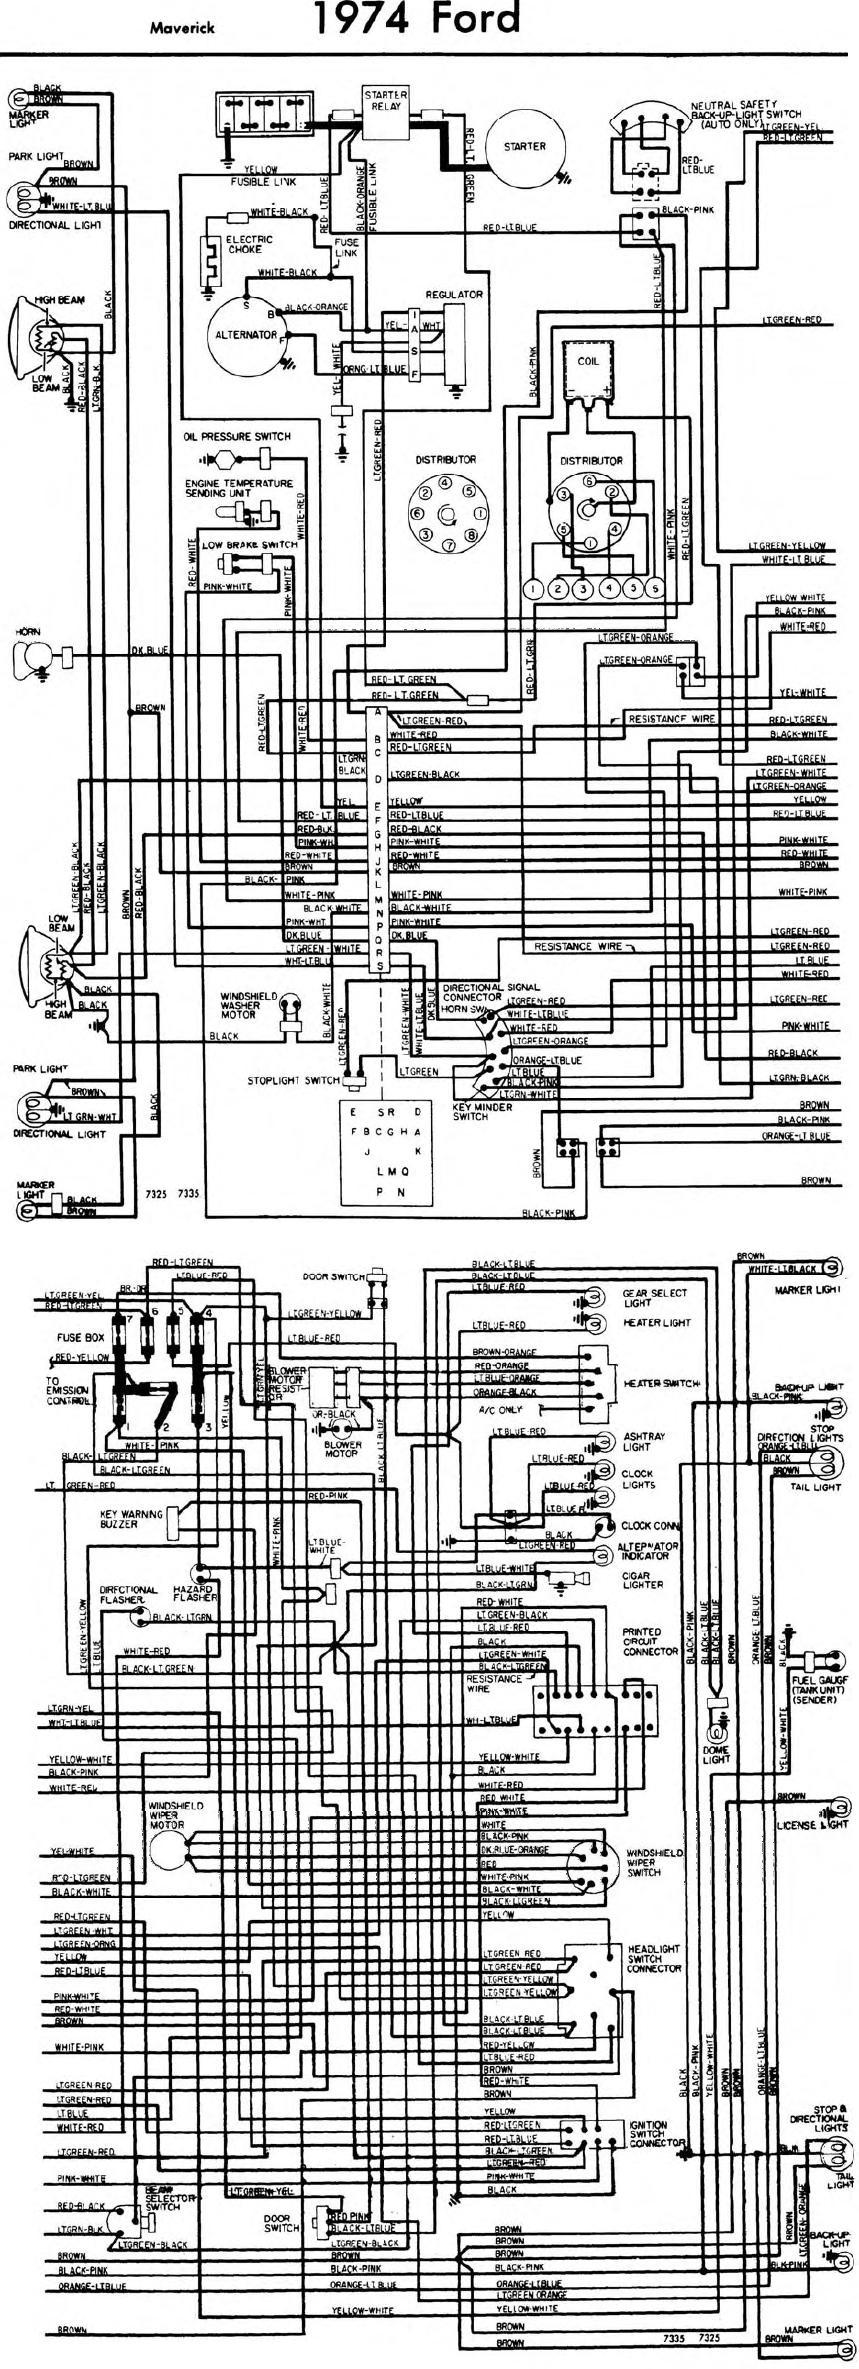 hight resolution of ford maverick starter wiring wiring diagram third level 1979 ford 302 distributor wiring diagram 1977 ford maverick wiring diagram